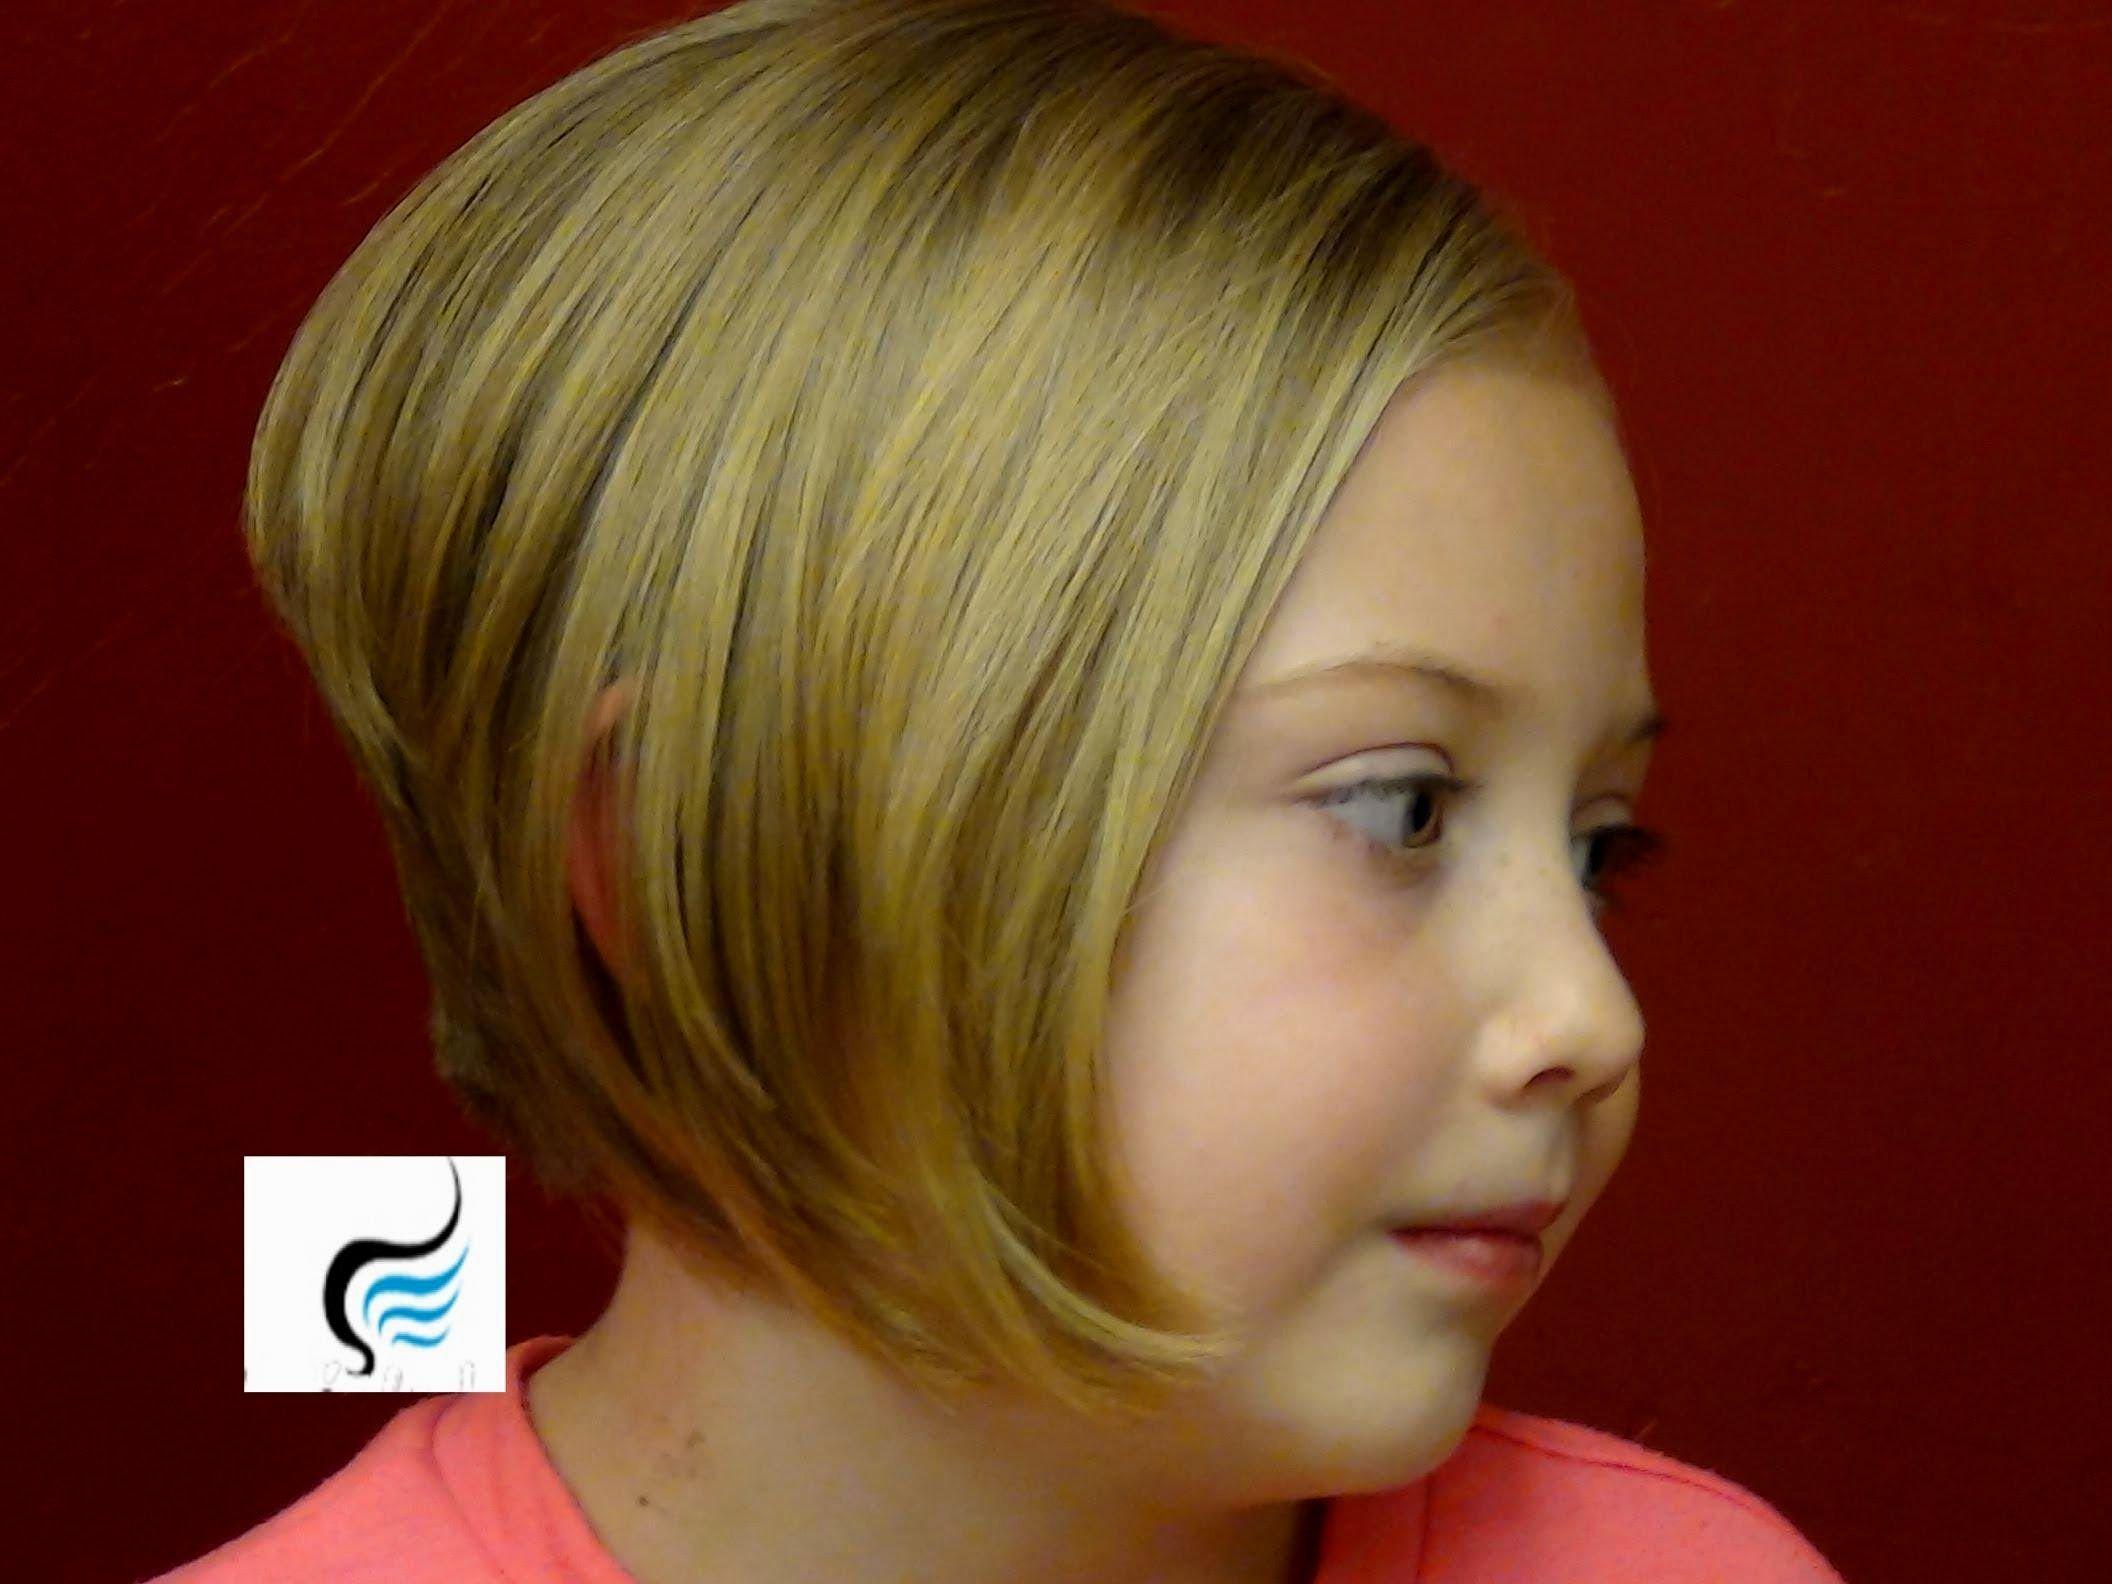 Bob hairstyles girls hairstyles pinterest hair hair cuts and